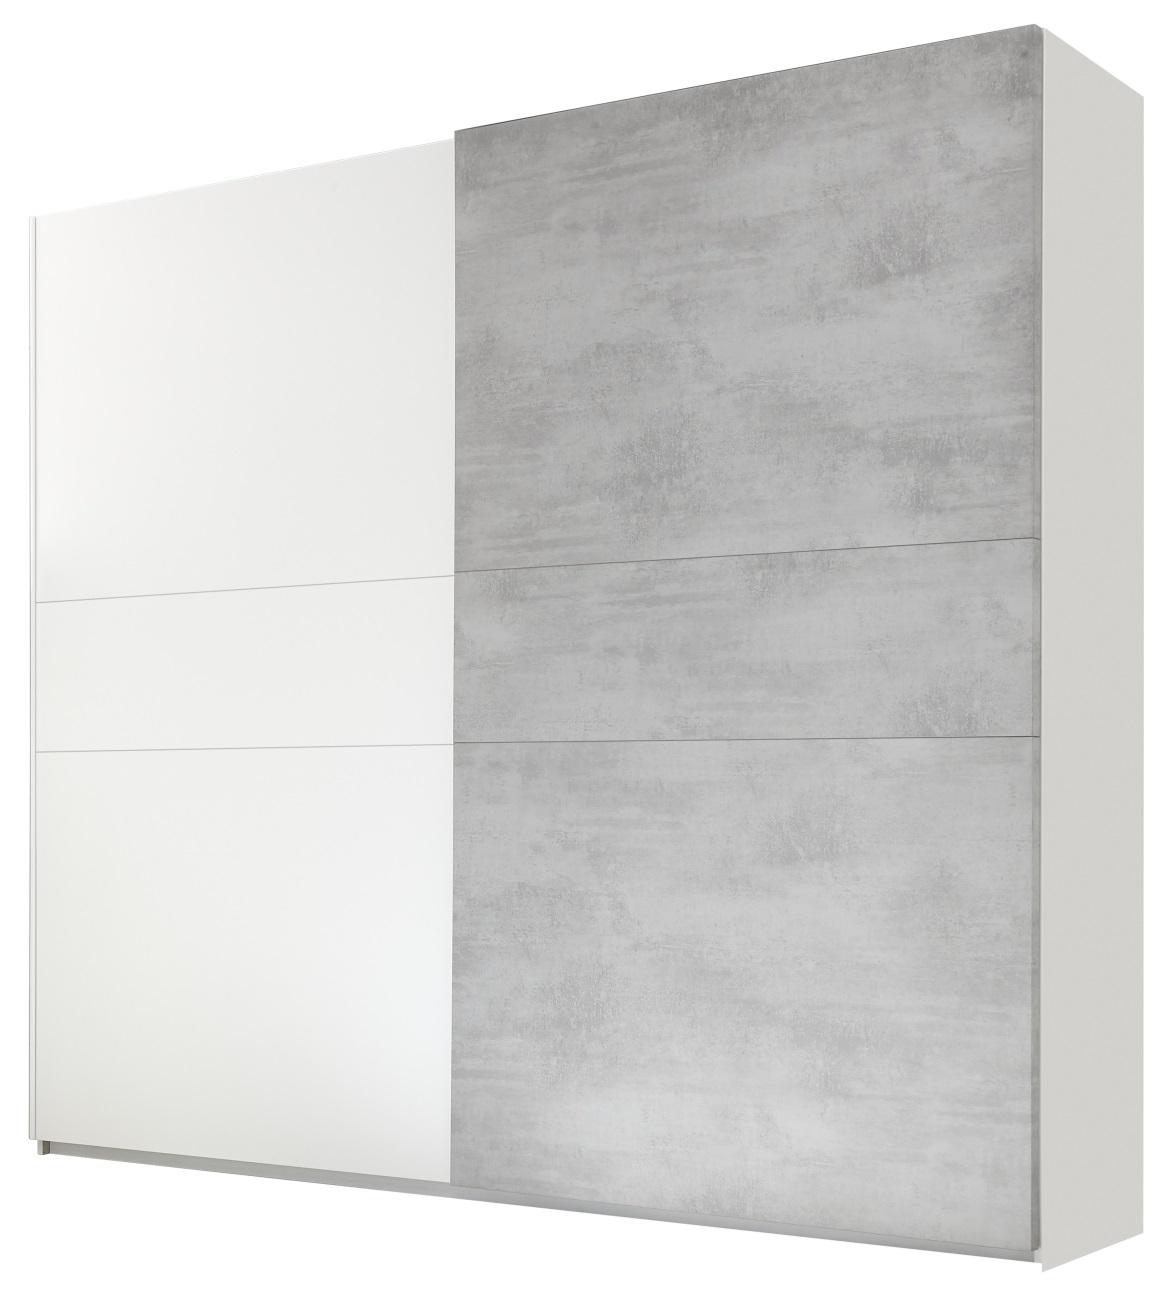 Kledingkast Amalti 275 cm breed in mat wit met grijs beton   Pesaro Mobilia